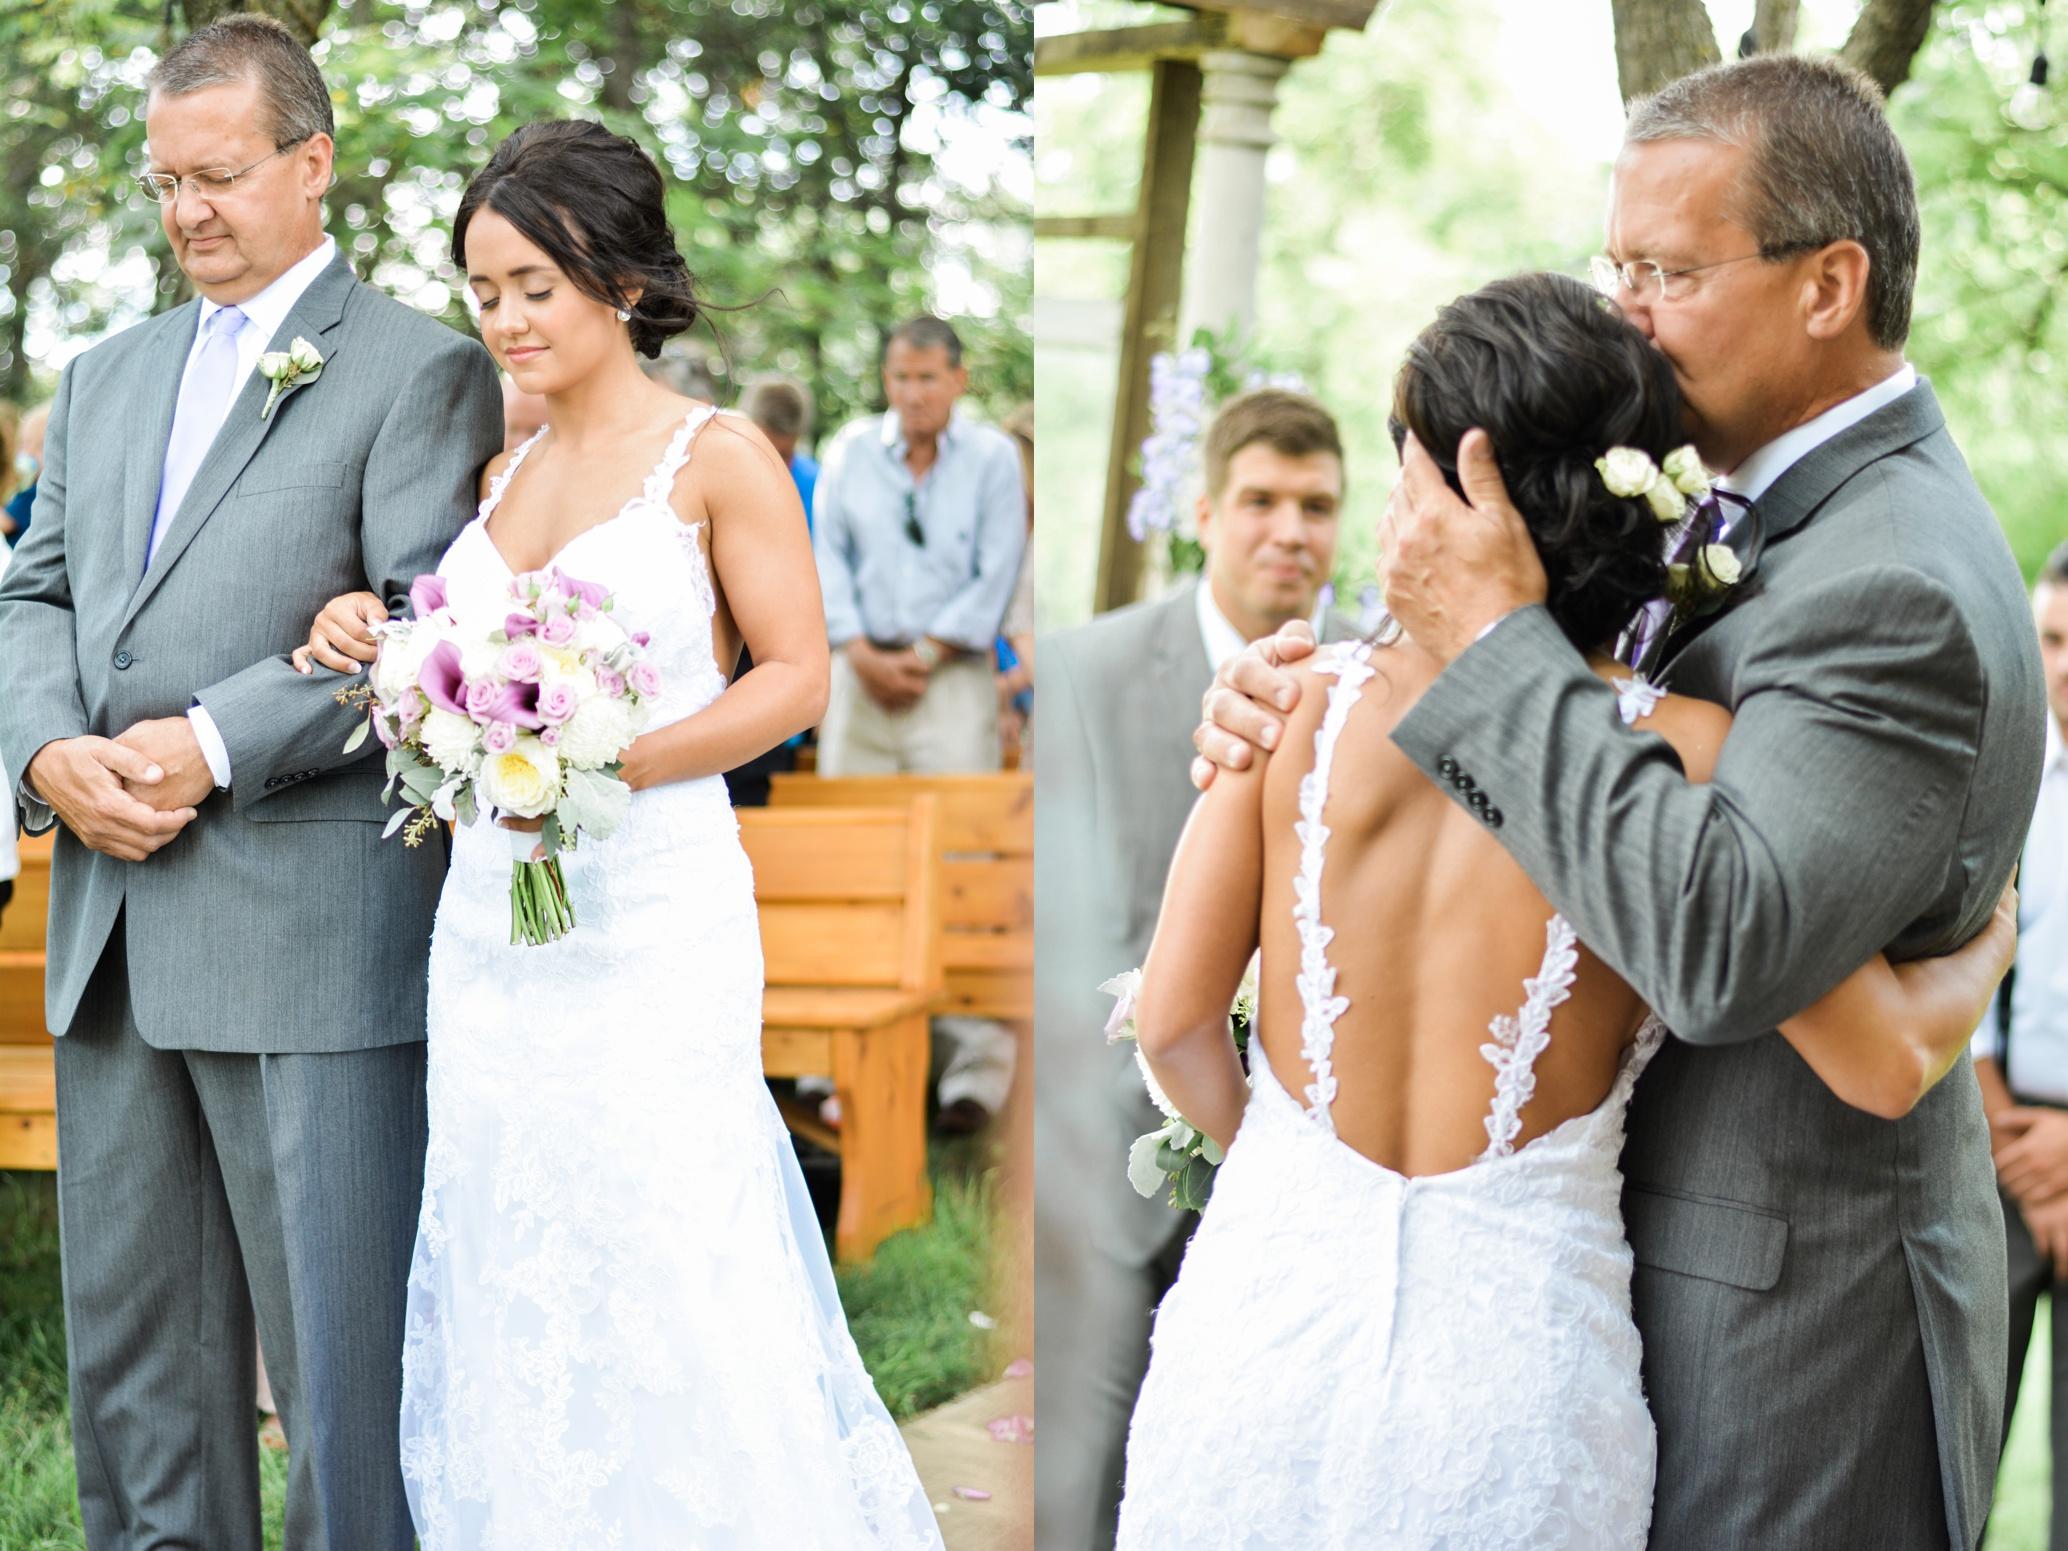 Barnes' Place Rustic Outdoor Wedding | Ali Leigh Photo Minneapolis Wedding Photographer_0113.jpg